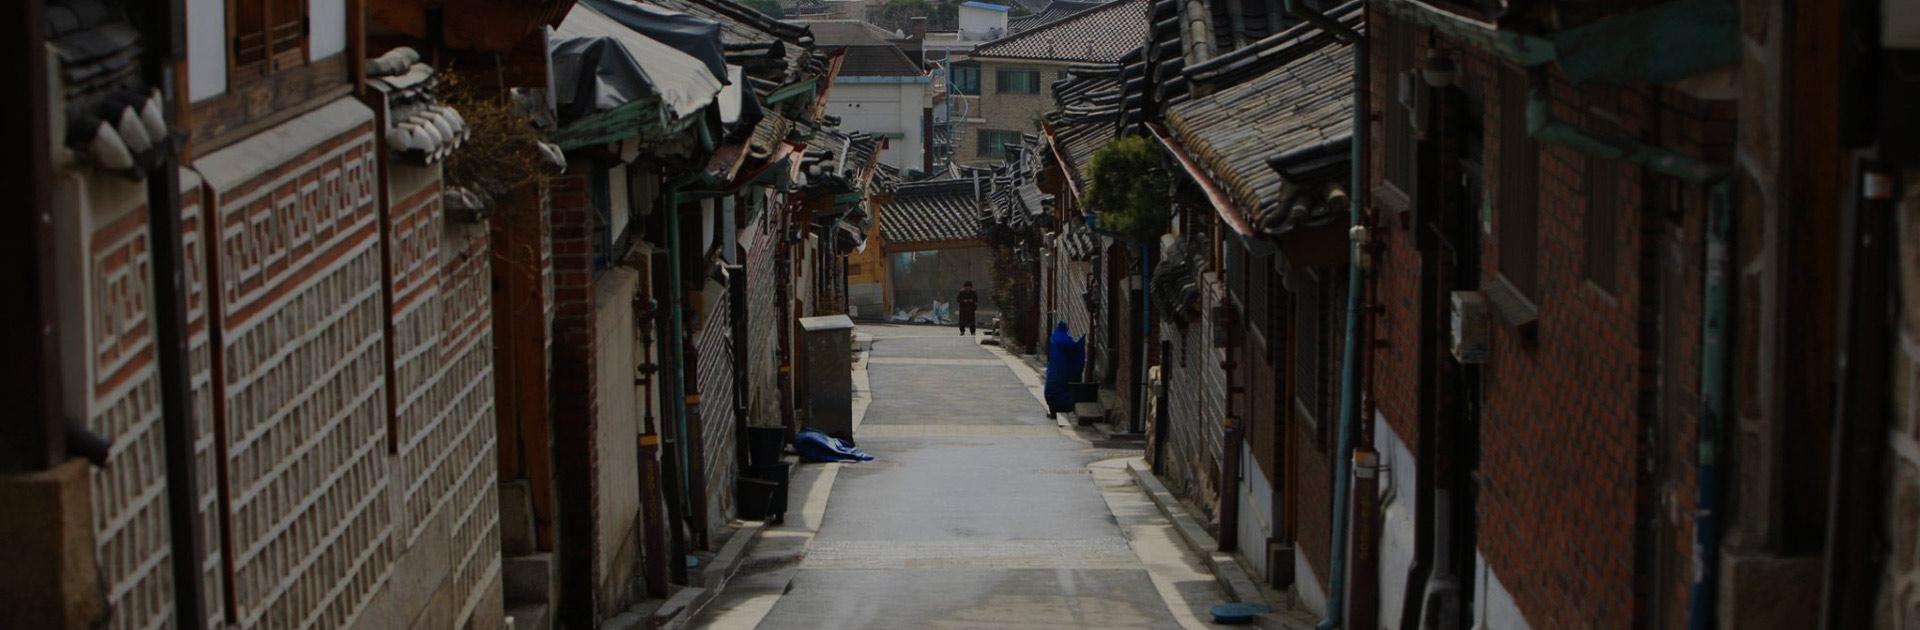 KR Corea del Sur Completo 5